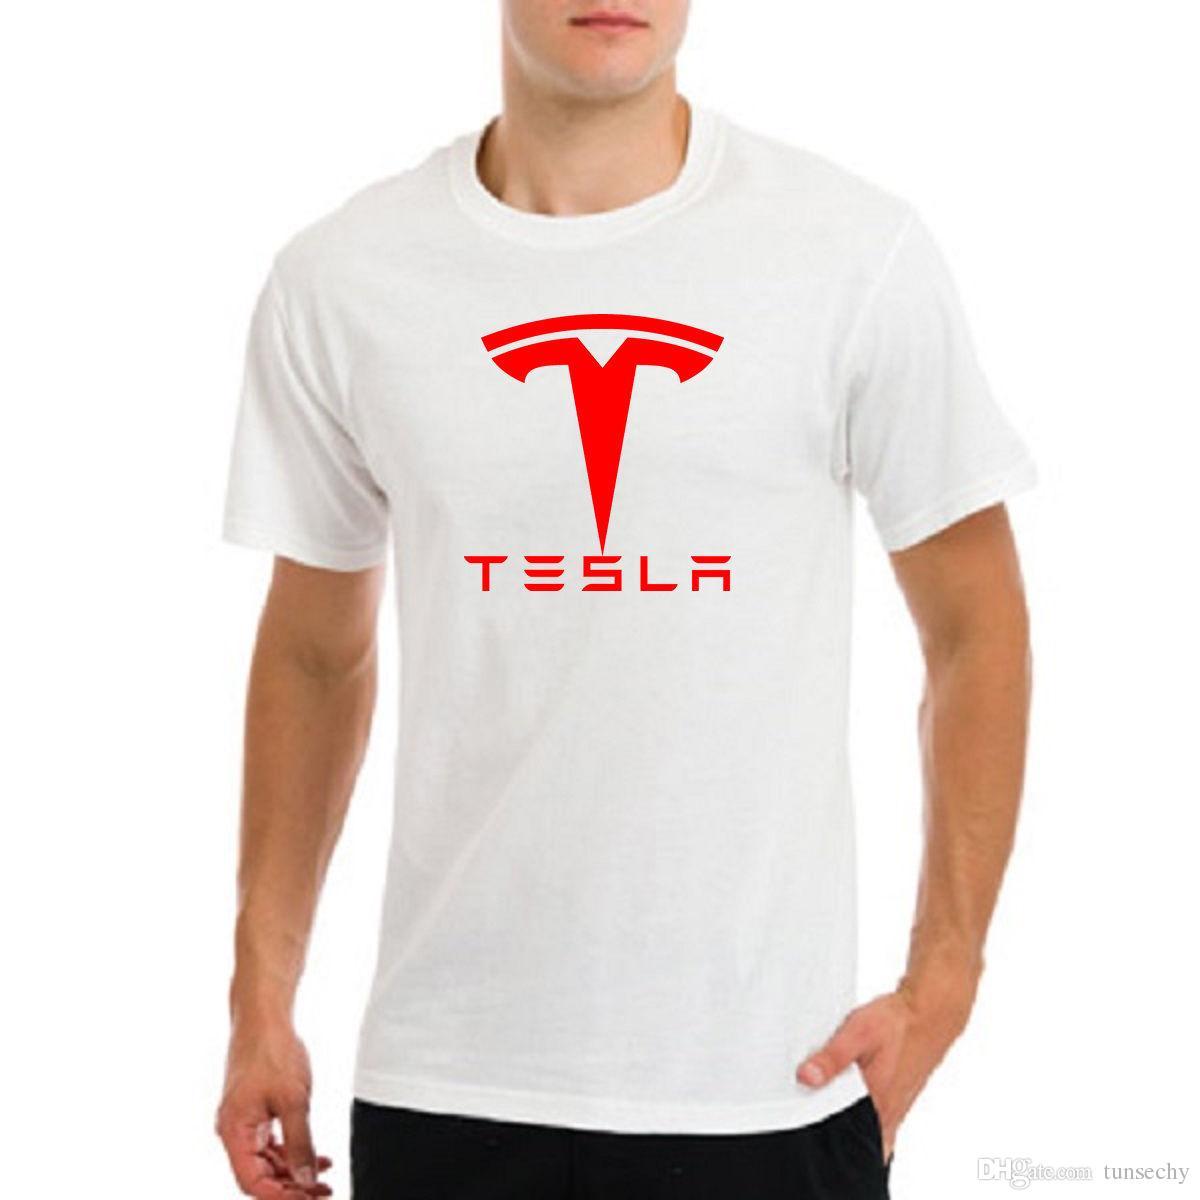 e5a31642a Tesla Motors Car Elon Musk Fan Moto Rally Electric Nikola Nerd Geek T Shirt  Cool Shirts Designs Pt Shirts From Customteestore, $11.17| DHgate.Com